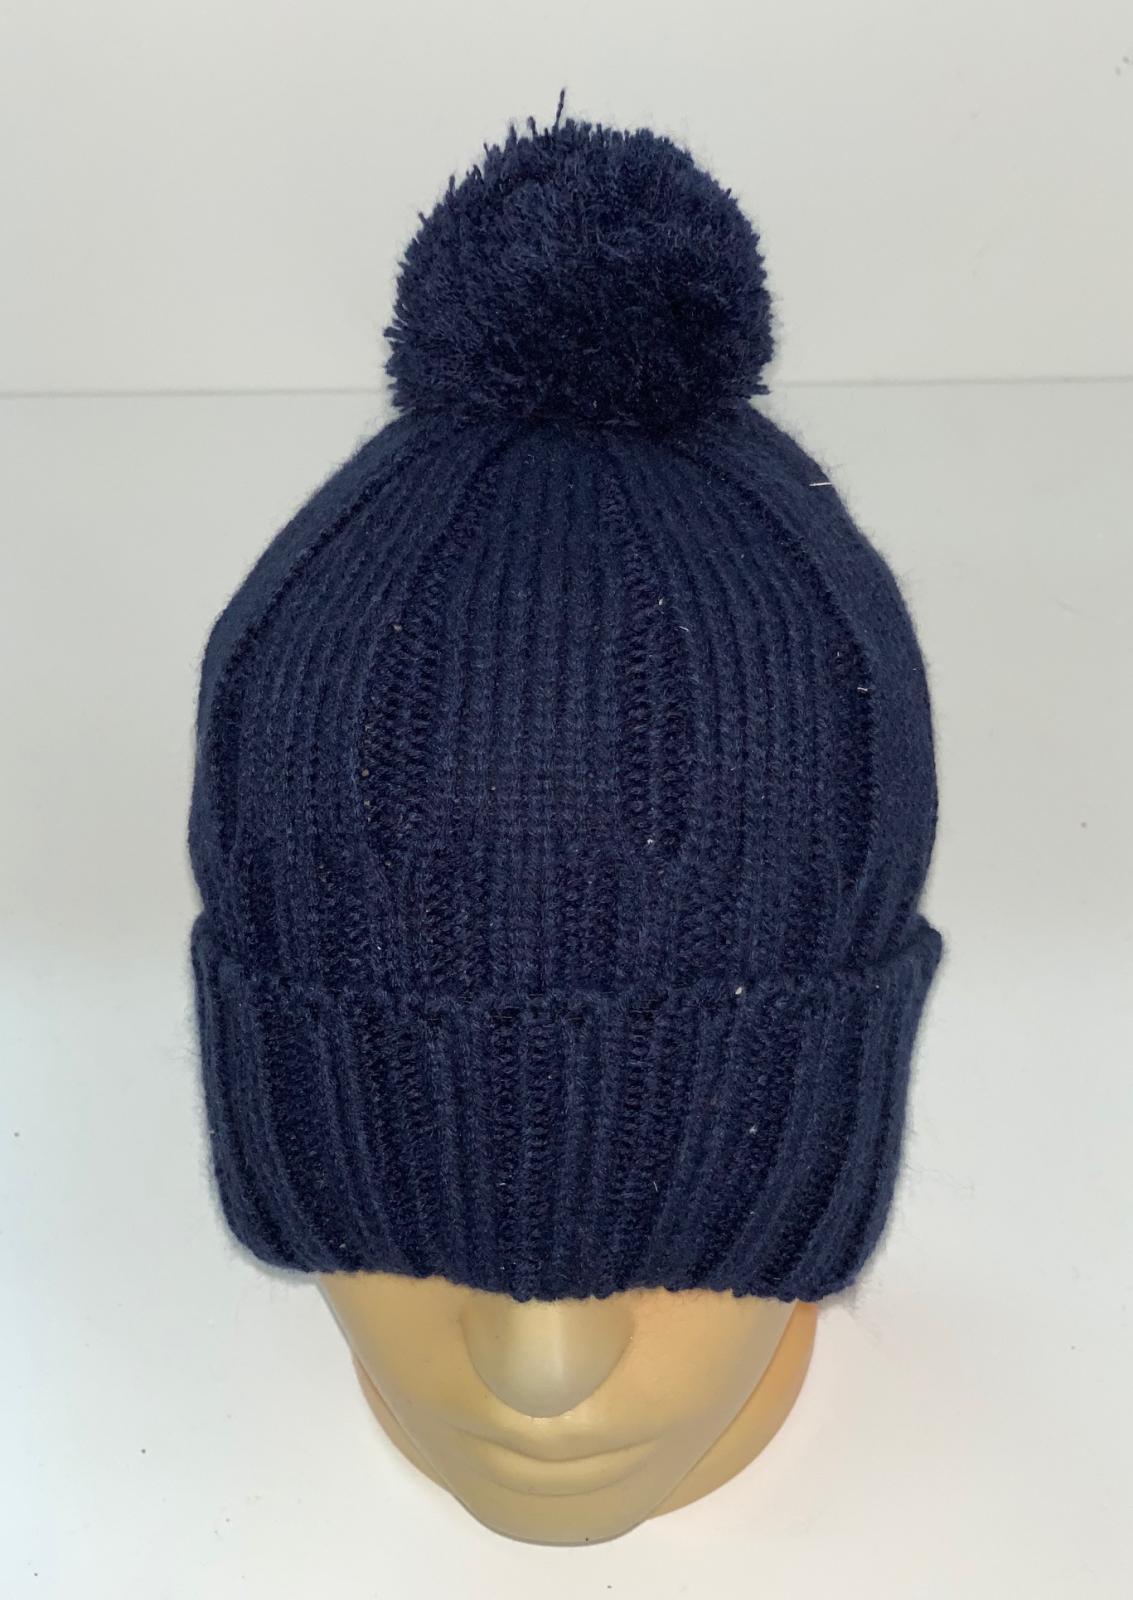 Темно-синяя вязаная шапка с помпоном